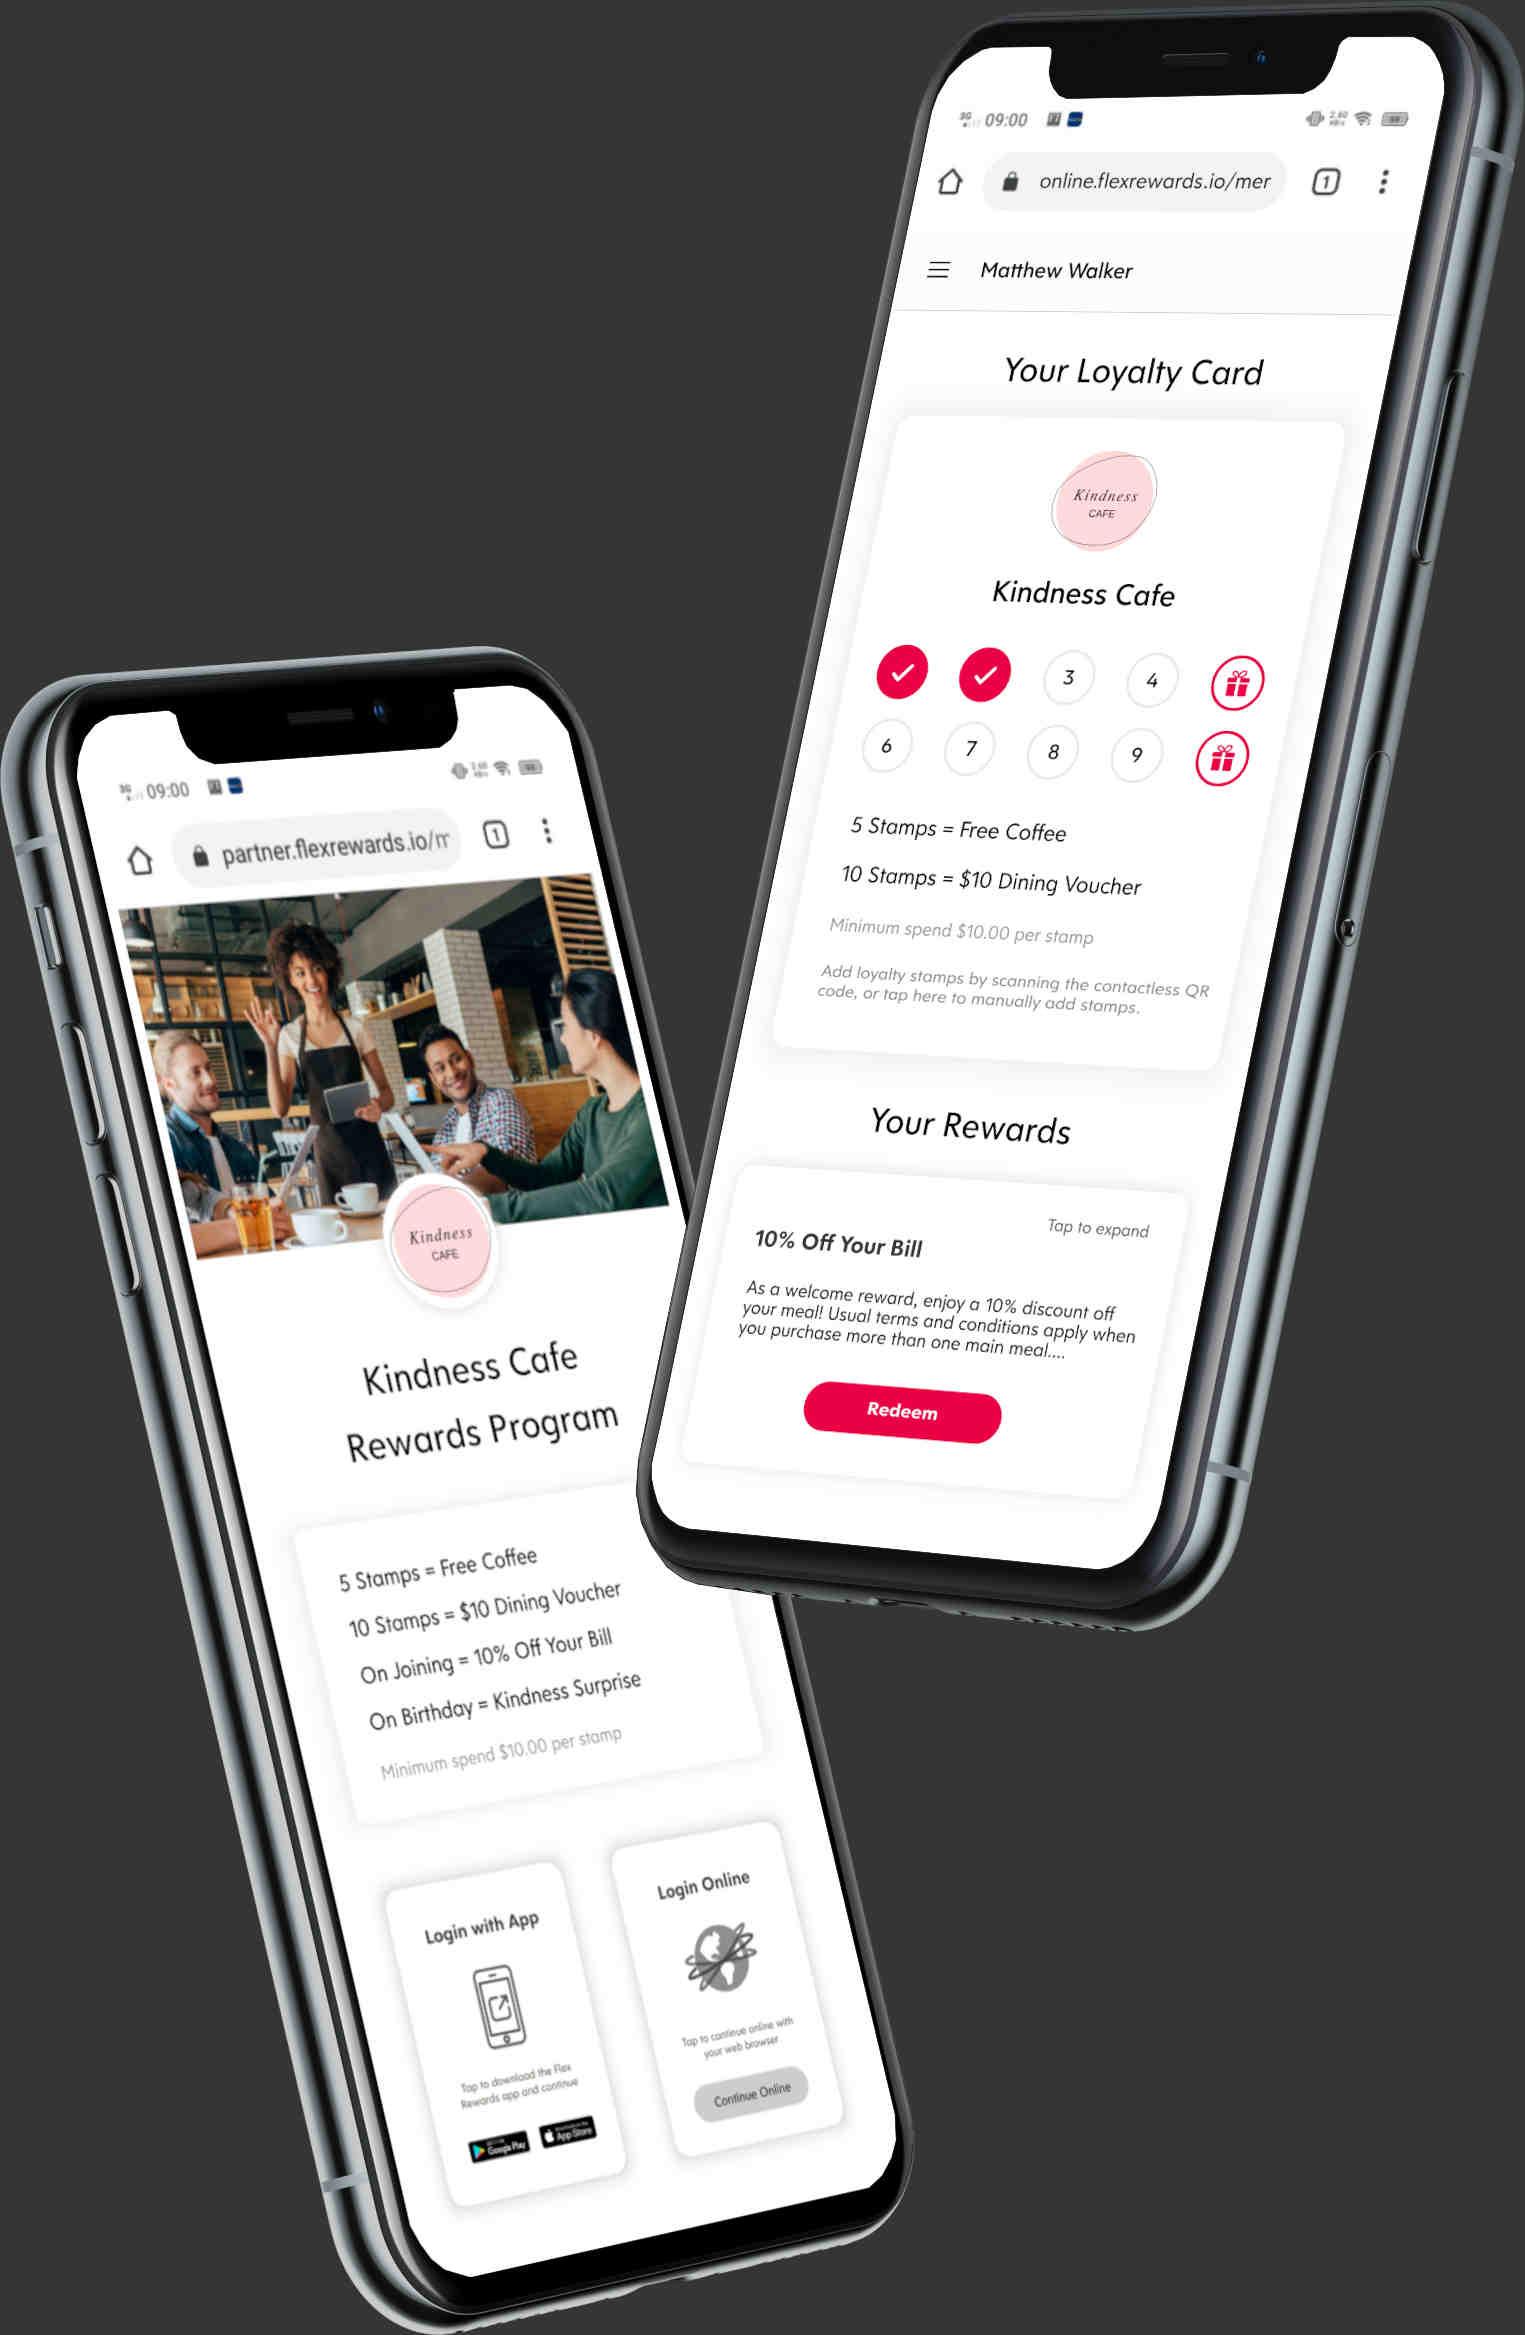 Screenshots of Flex Rewards Web App Loyalty Program